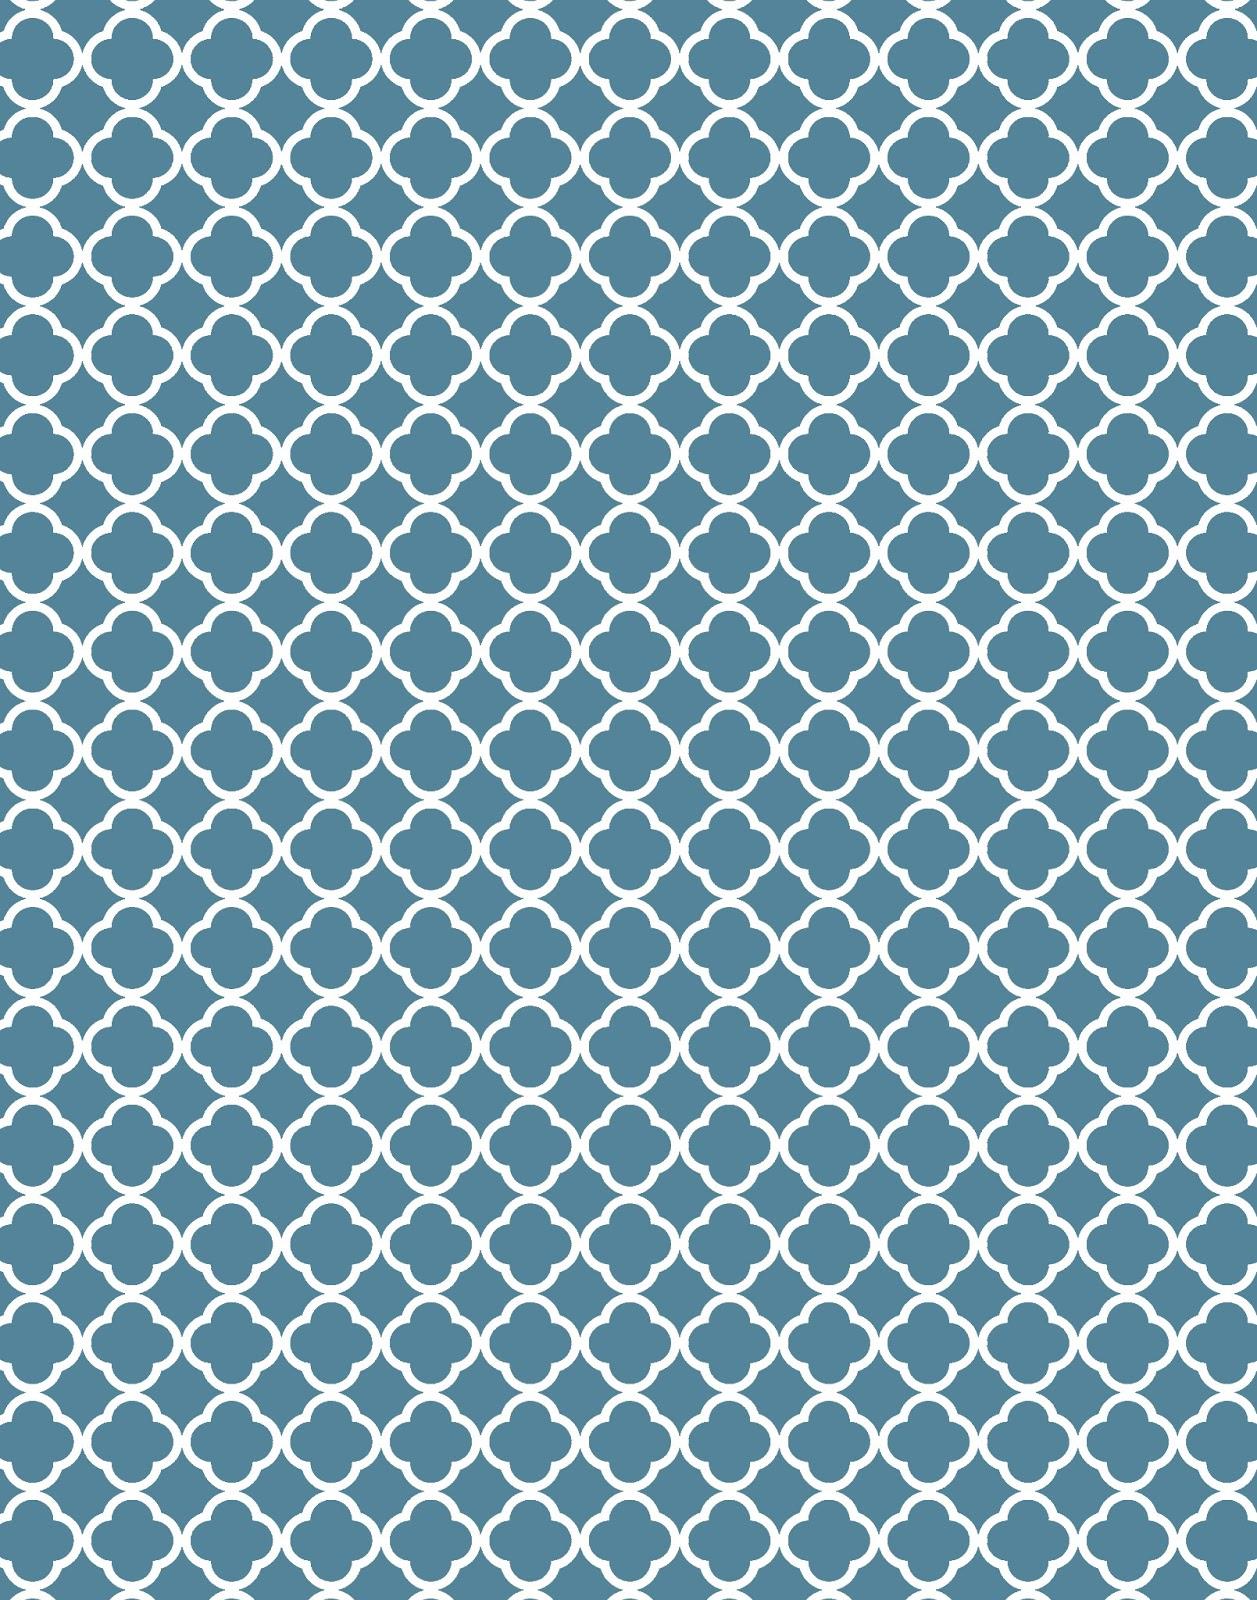 quatrefoil pattern background - photo #11